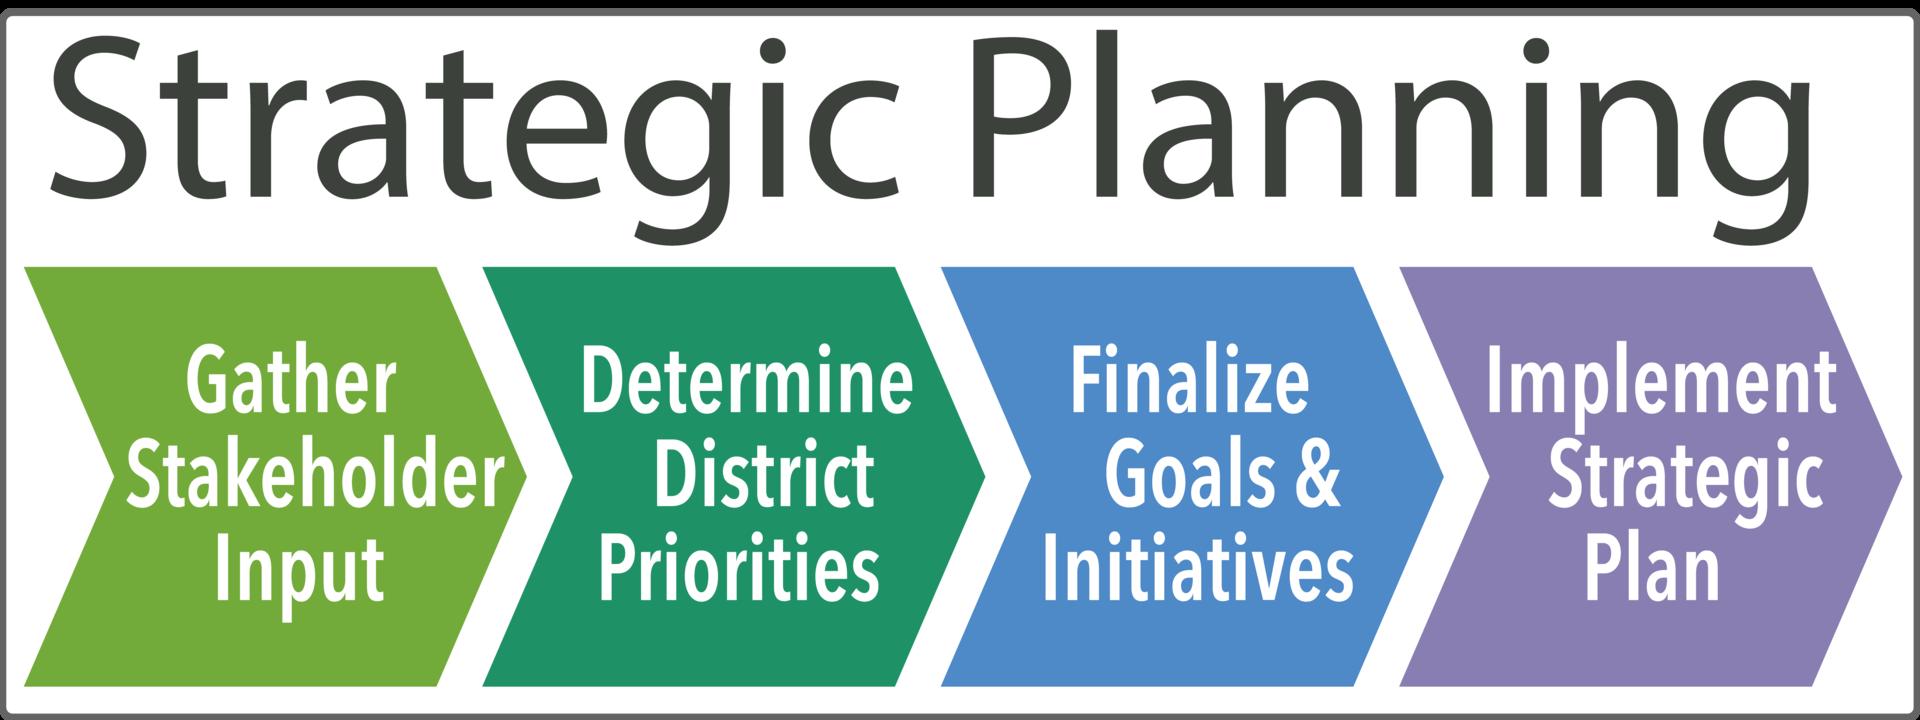 Strategic Planning Flow Chart